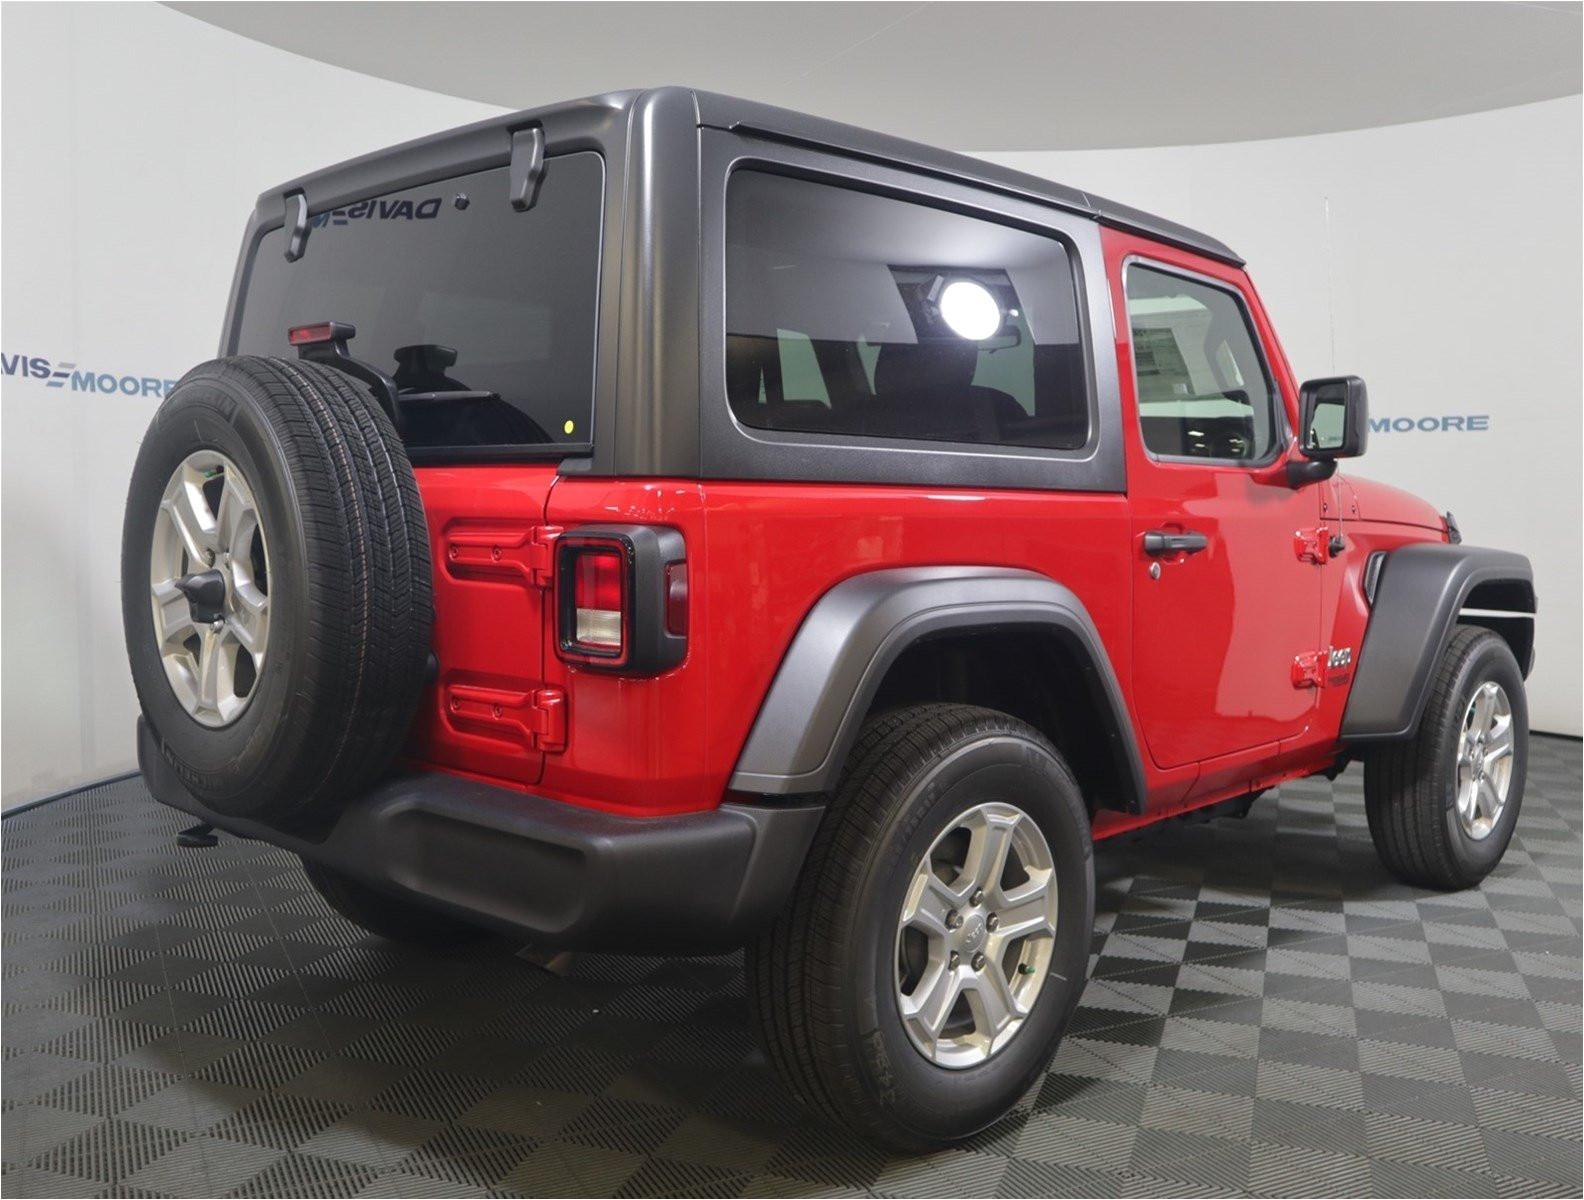 2019 jeep wrangler sport s in wichita ks davis moore auto group